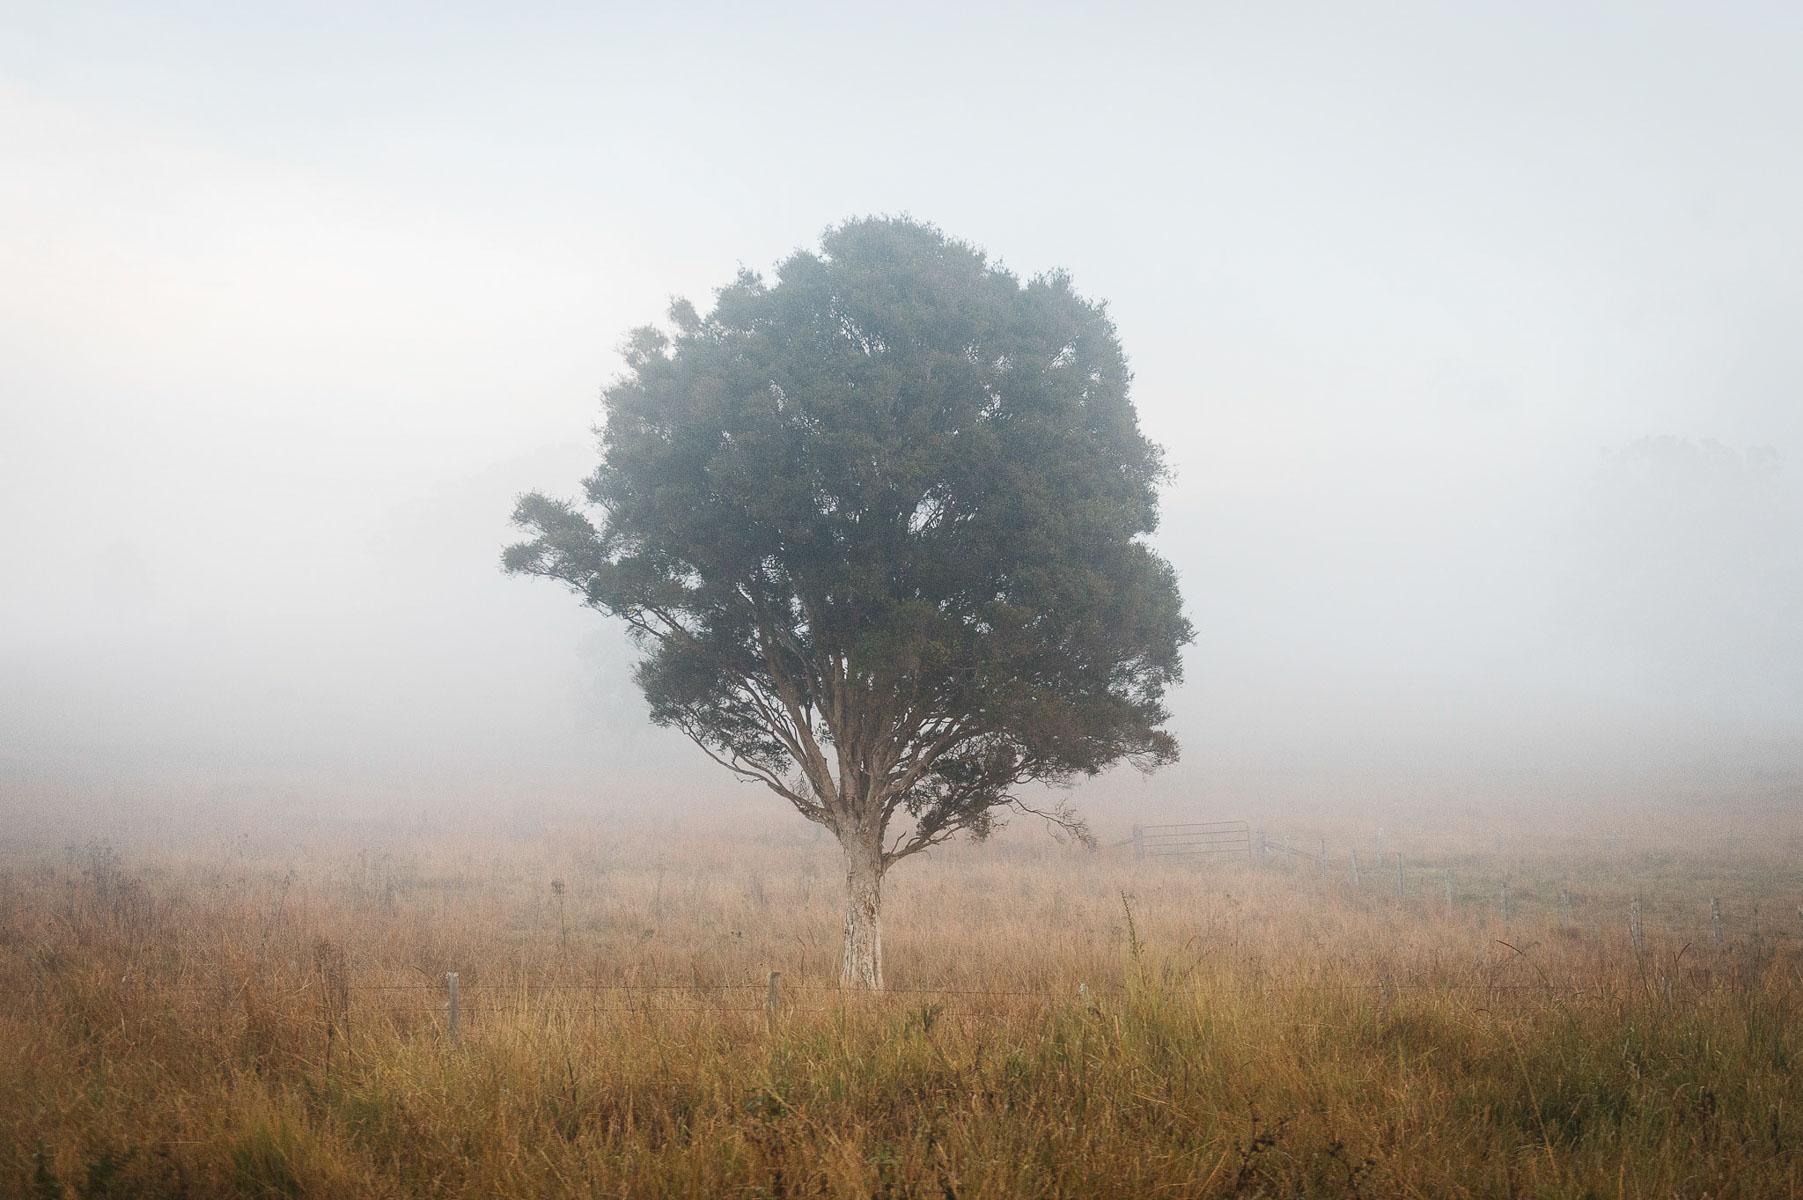 160705-dadsdeath-tree-4459